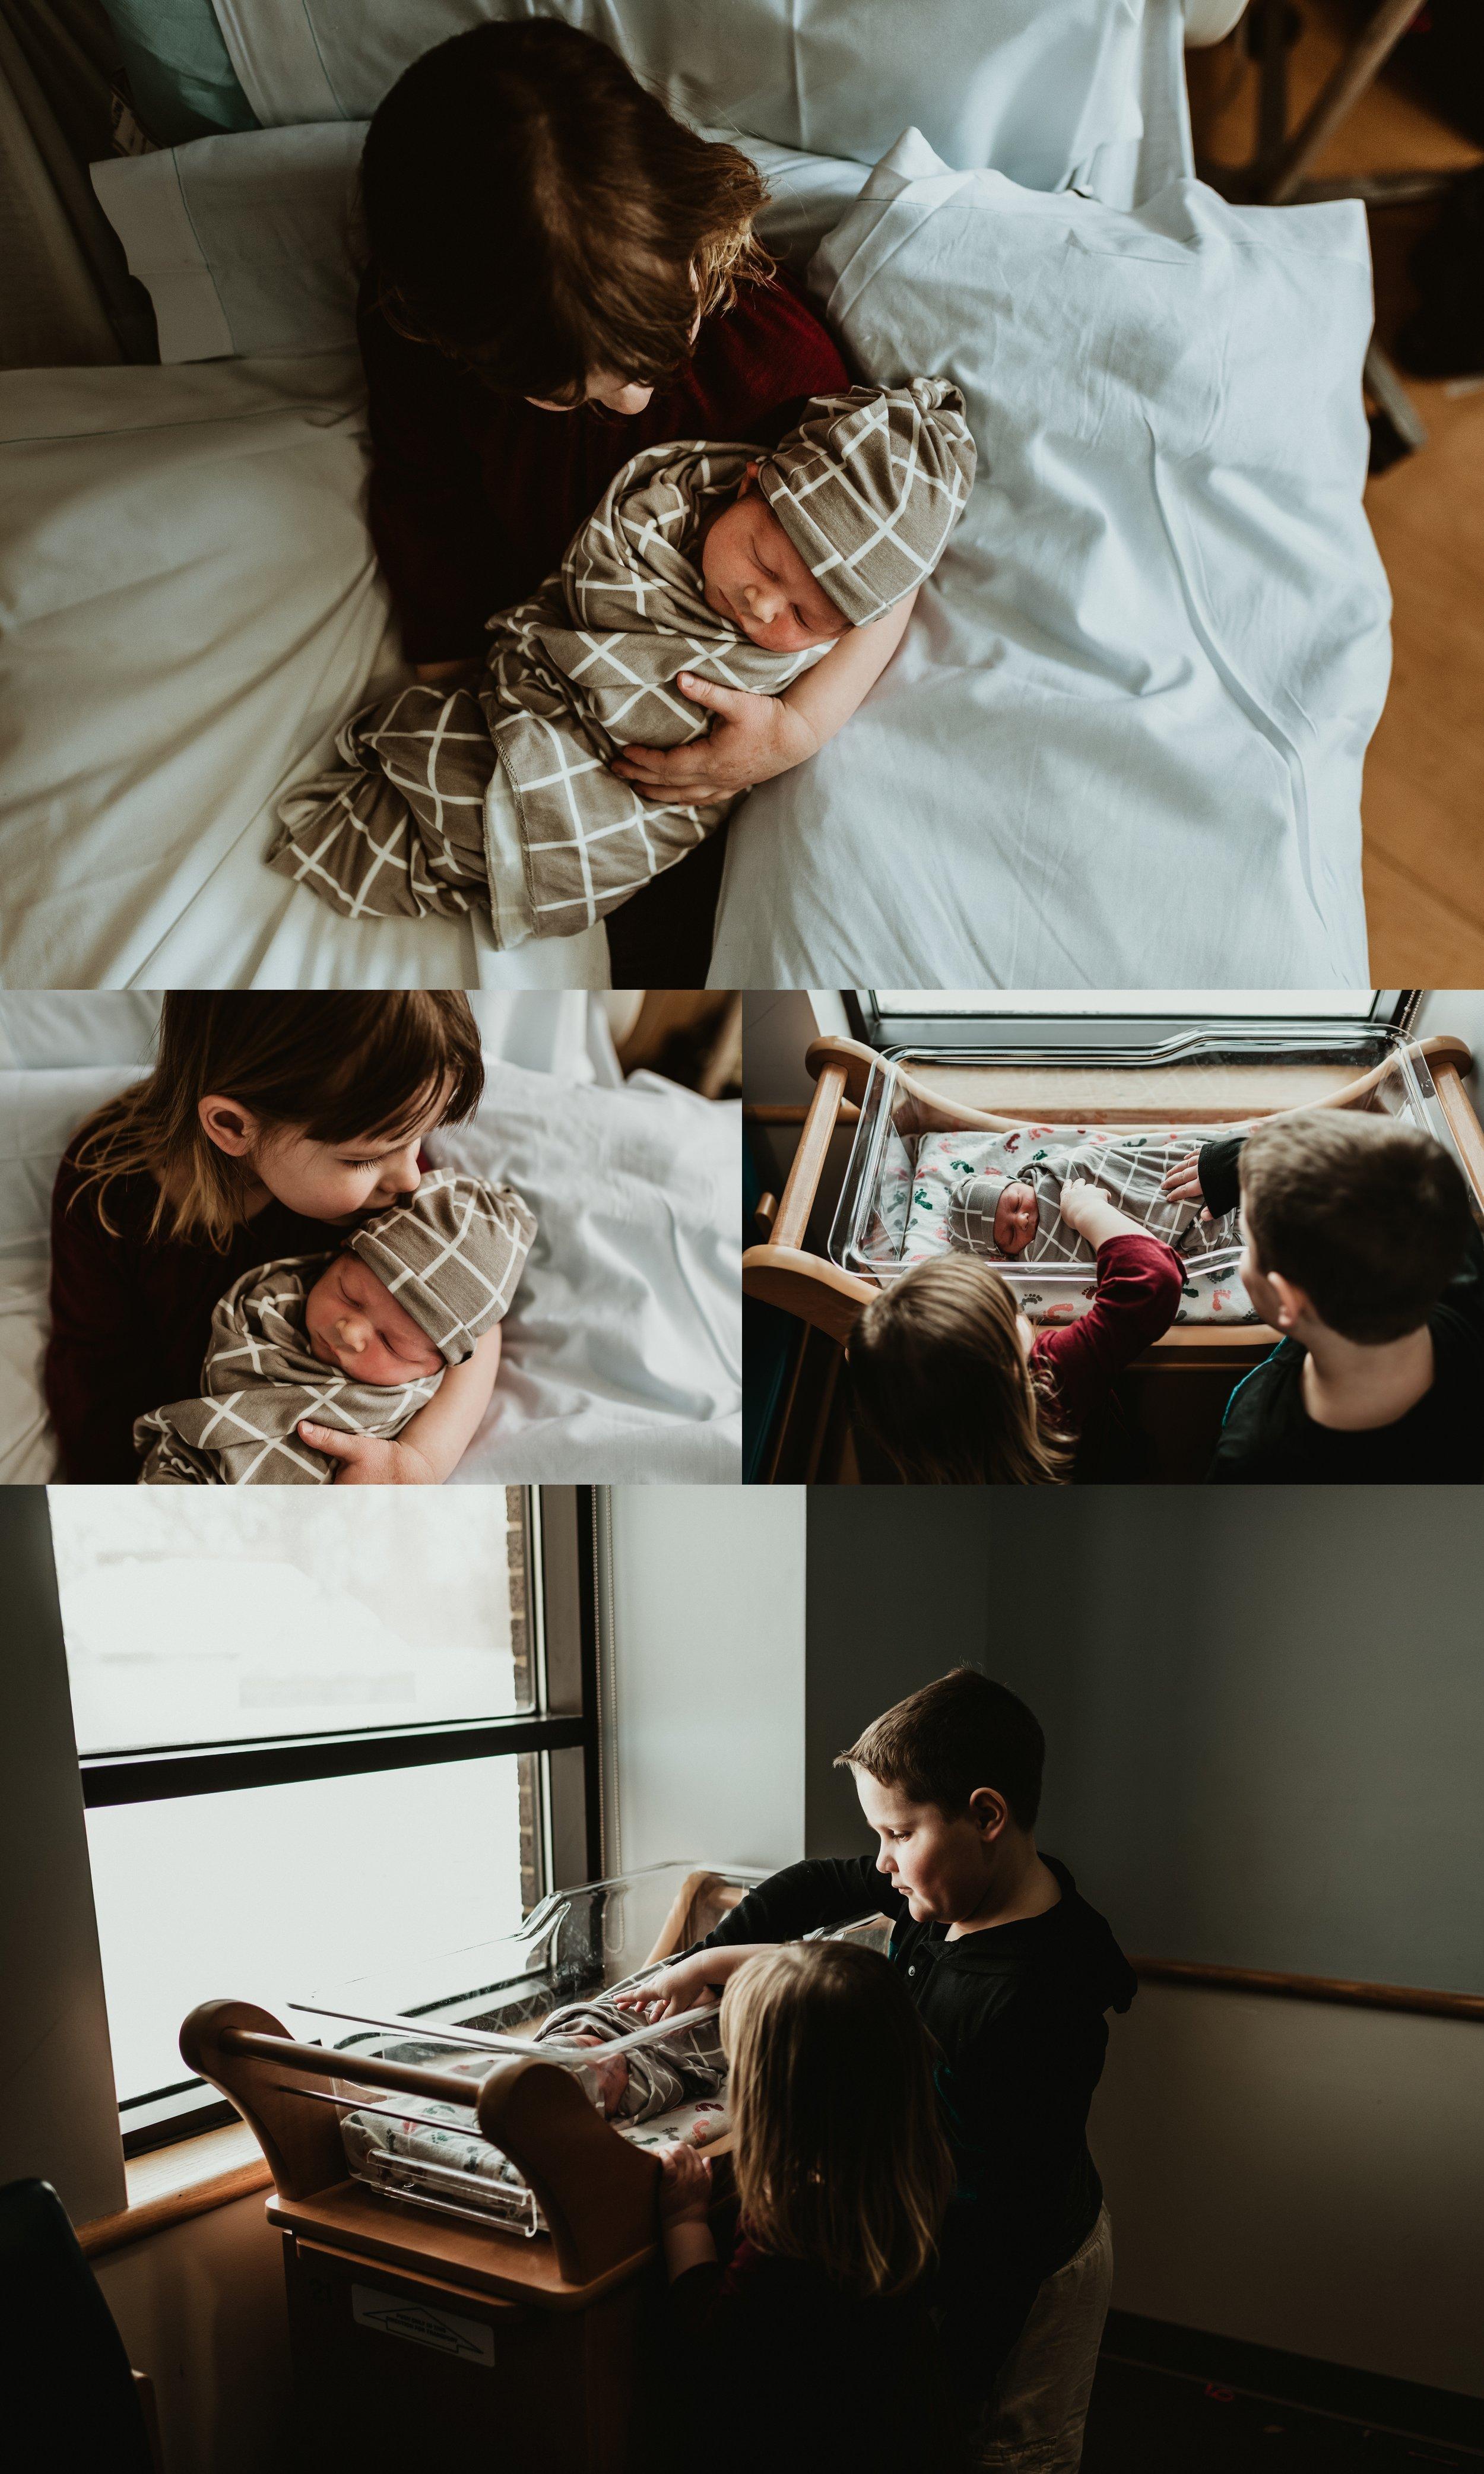 Fresh 48 Newborn Hospital Photo Session | Documentary & Lifestyle Newborn Photo | Baby Boy  | 20 Hours Old | Big Sister with New Baby